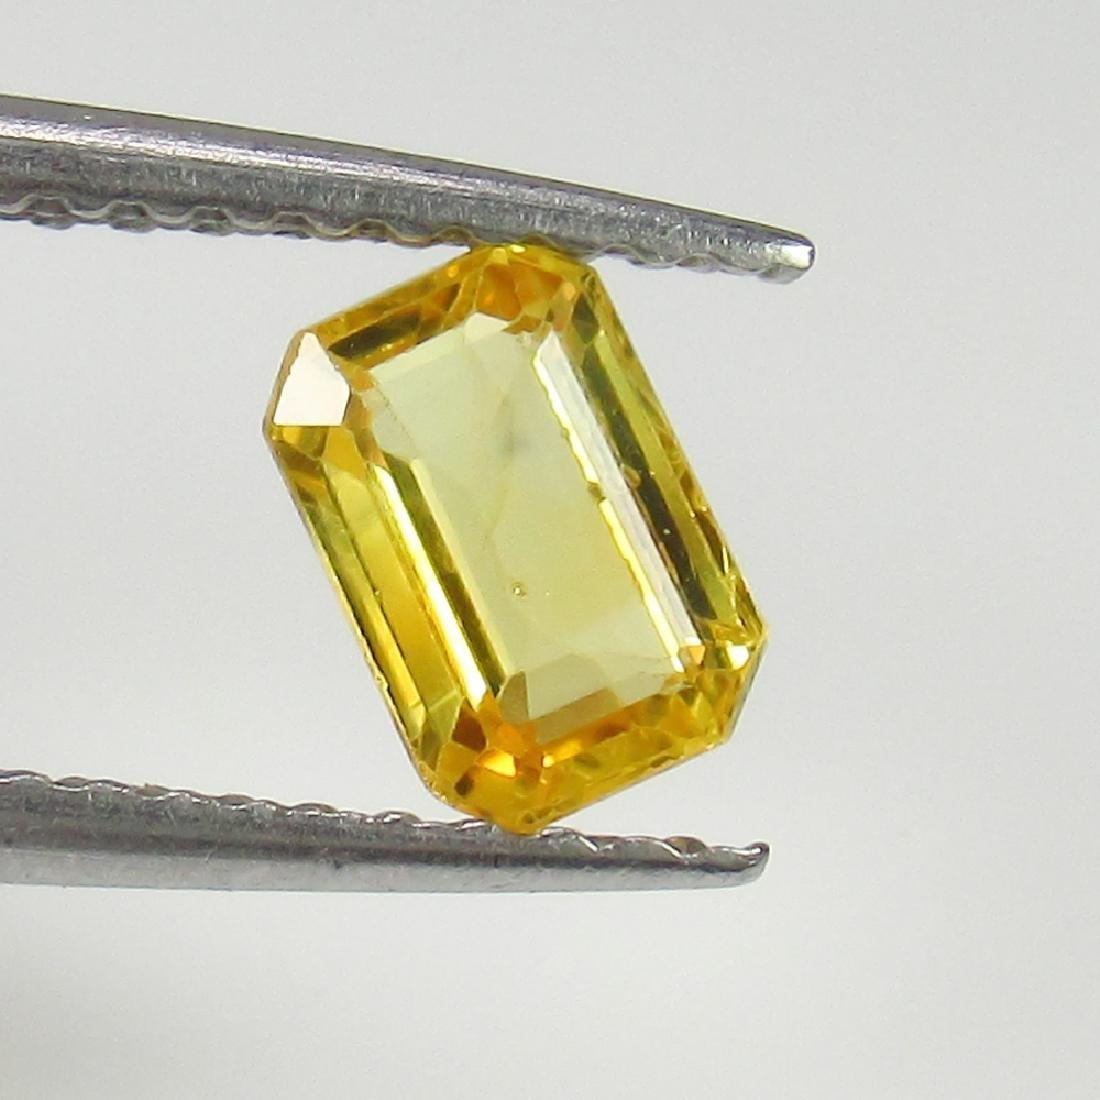 0.68 Ct Genuine Ceylon Yellow Sapphire Excellent